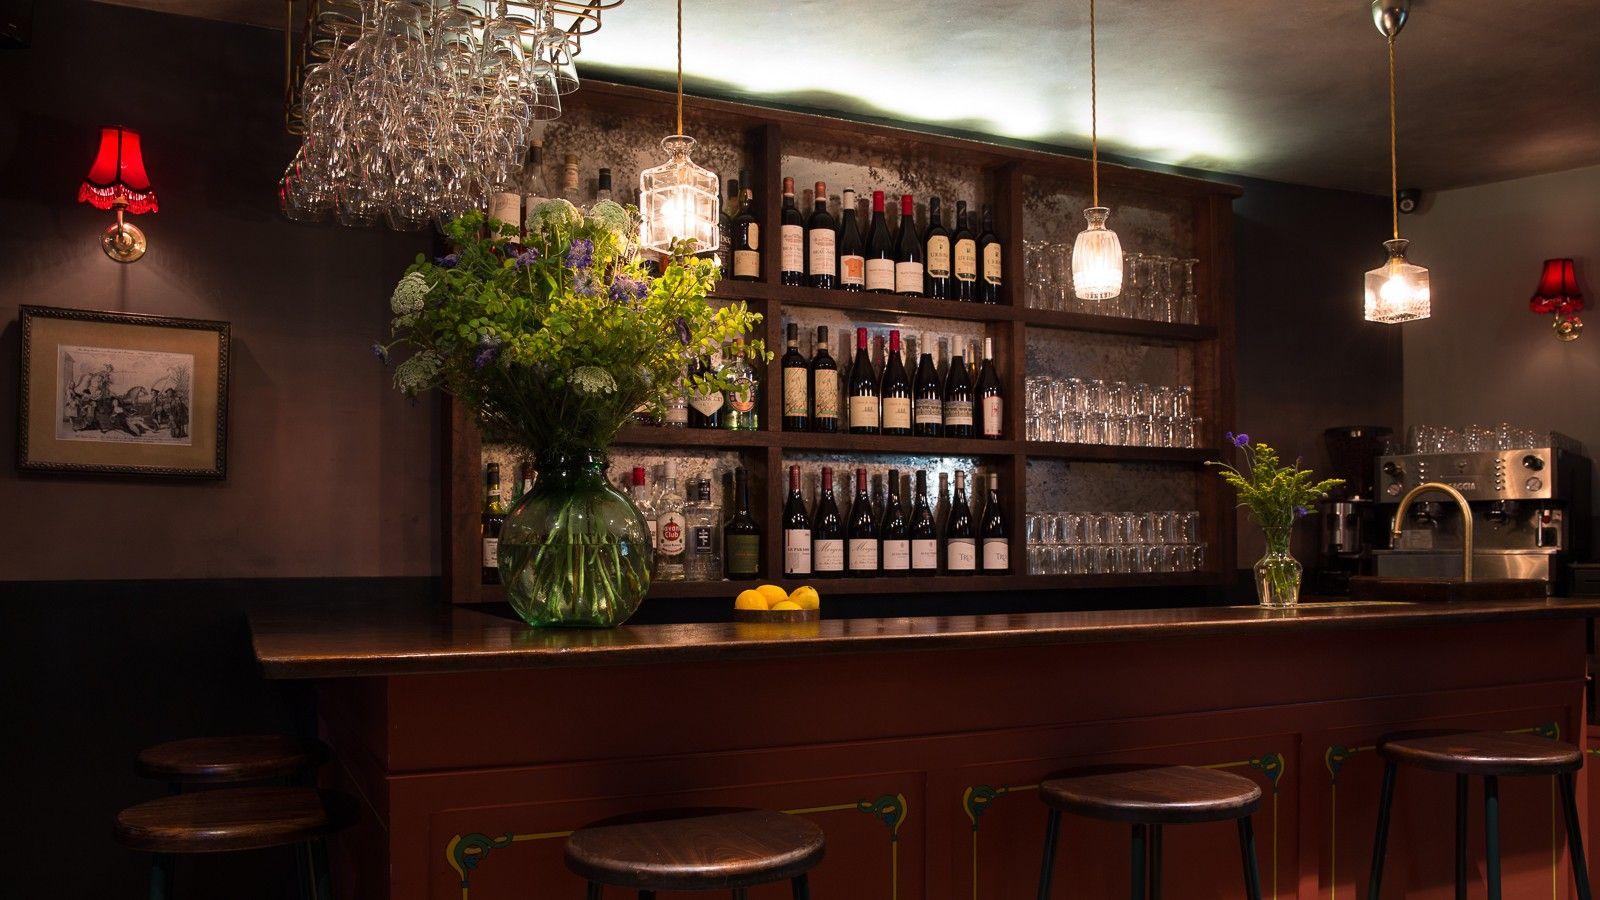 Kitty Fishers, Mayfair Home decor, Liquor